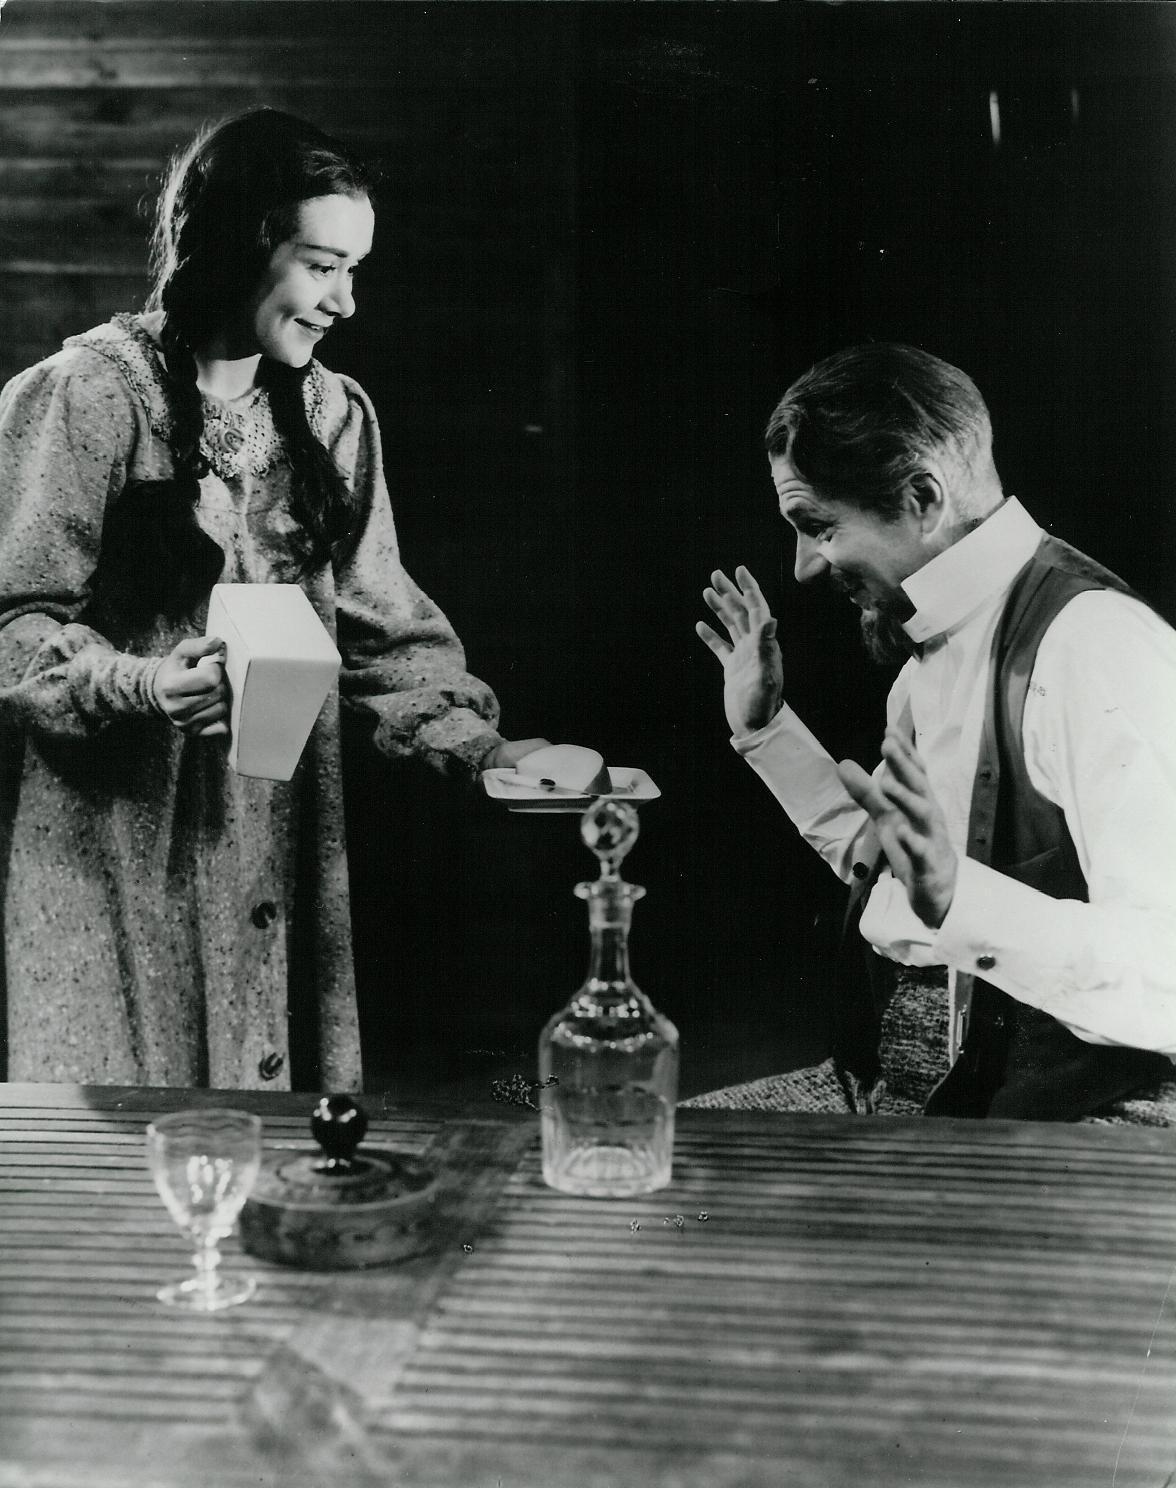 Joan Plowright & Laurence Olivier